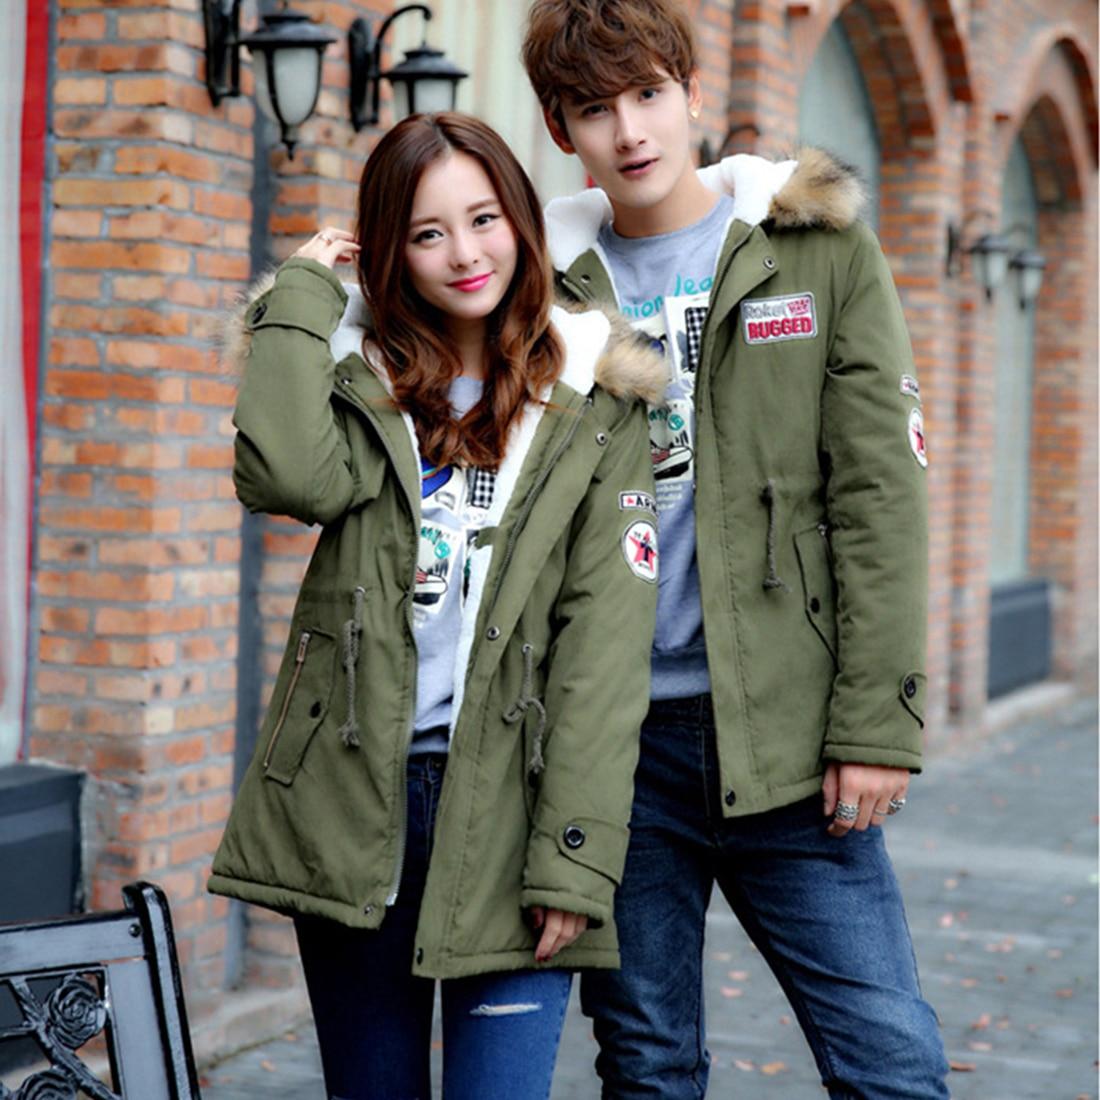 Fashion Women and Men Winter Warm Coat Casual Plus Size Hooded Zipper Up Couple Jackets Outwear Parka Green Red KhakiÎäåæäà è àêñåññóàðû<br><br>